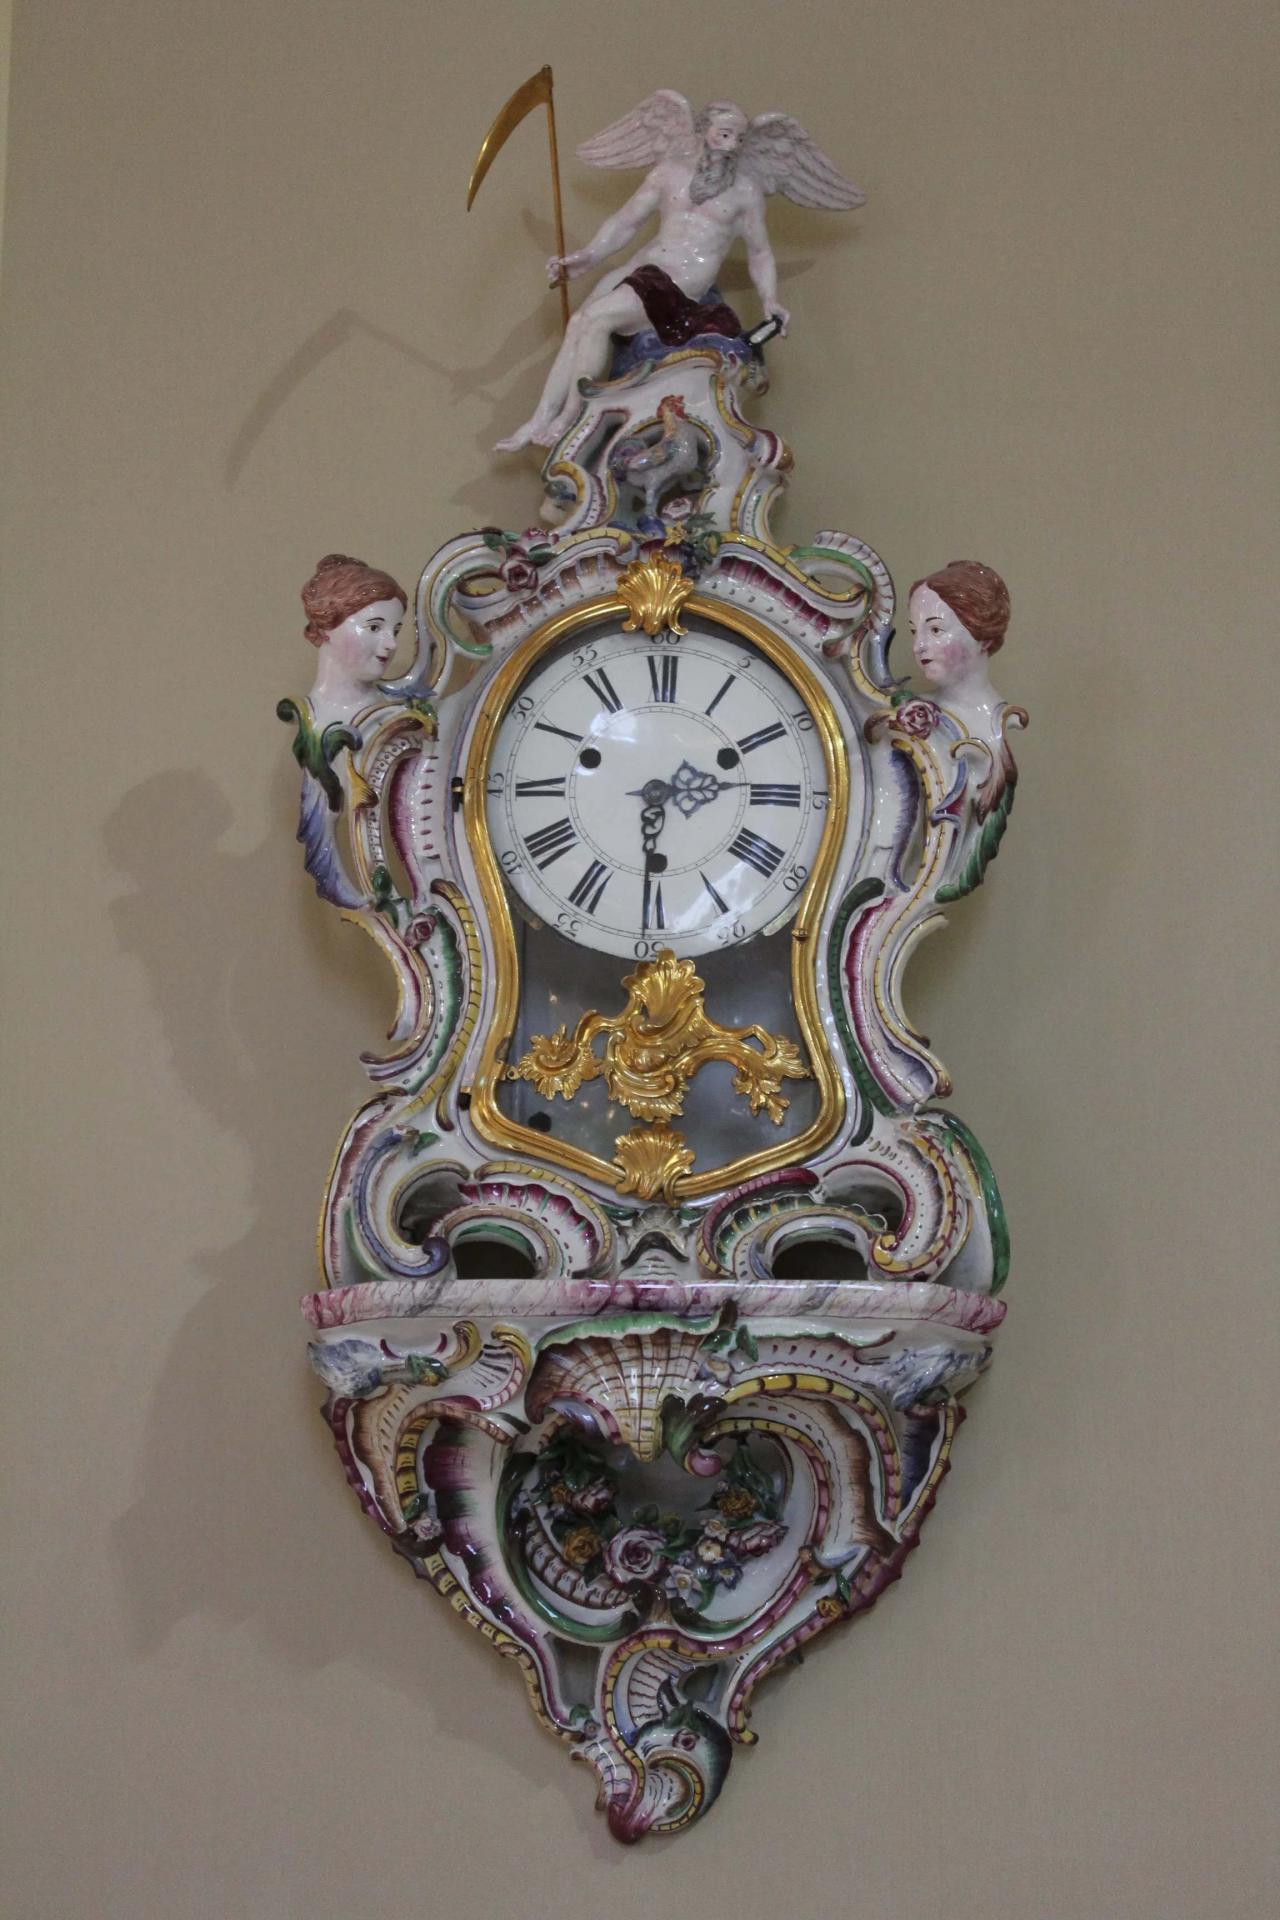 Horloge xviiie